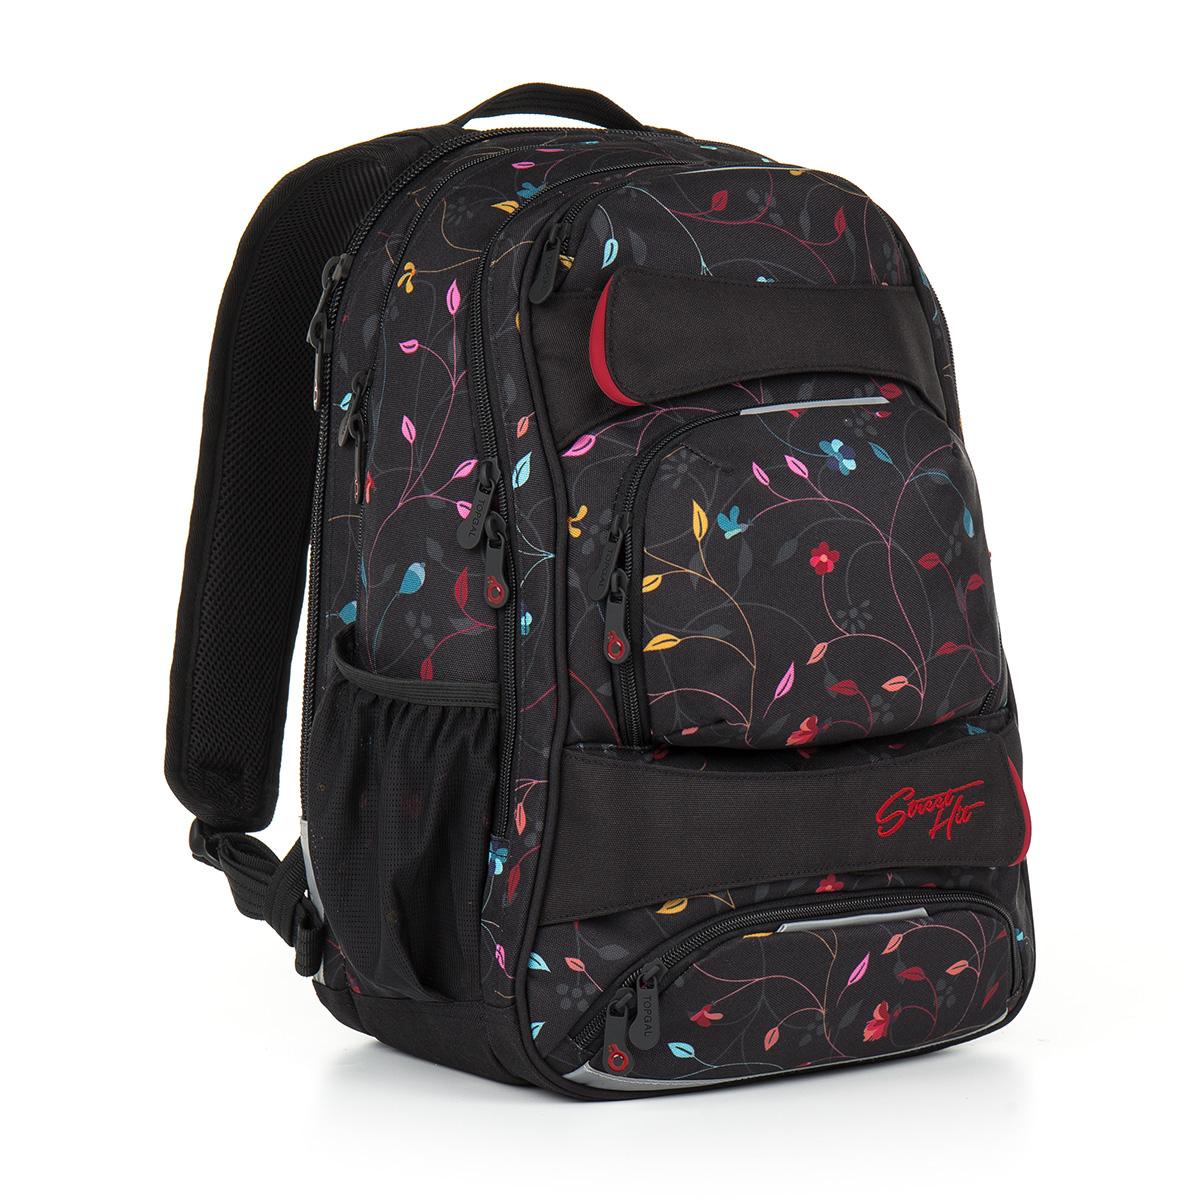 Topgal studentský batoh HIT 885 A - Black